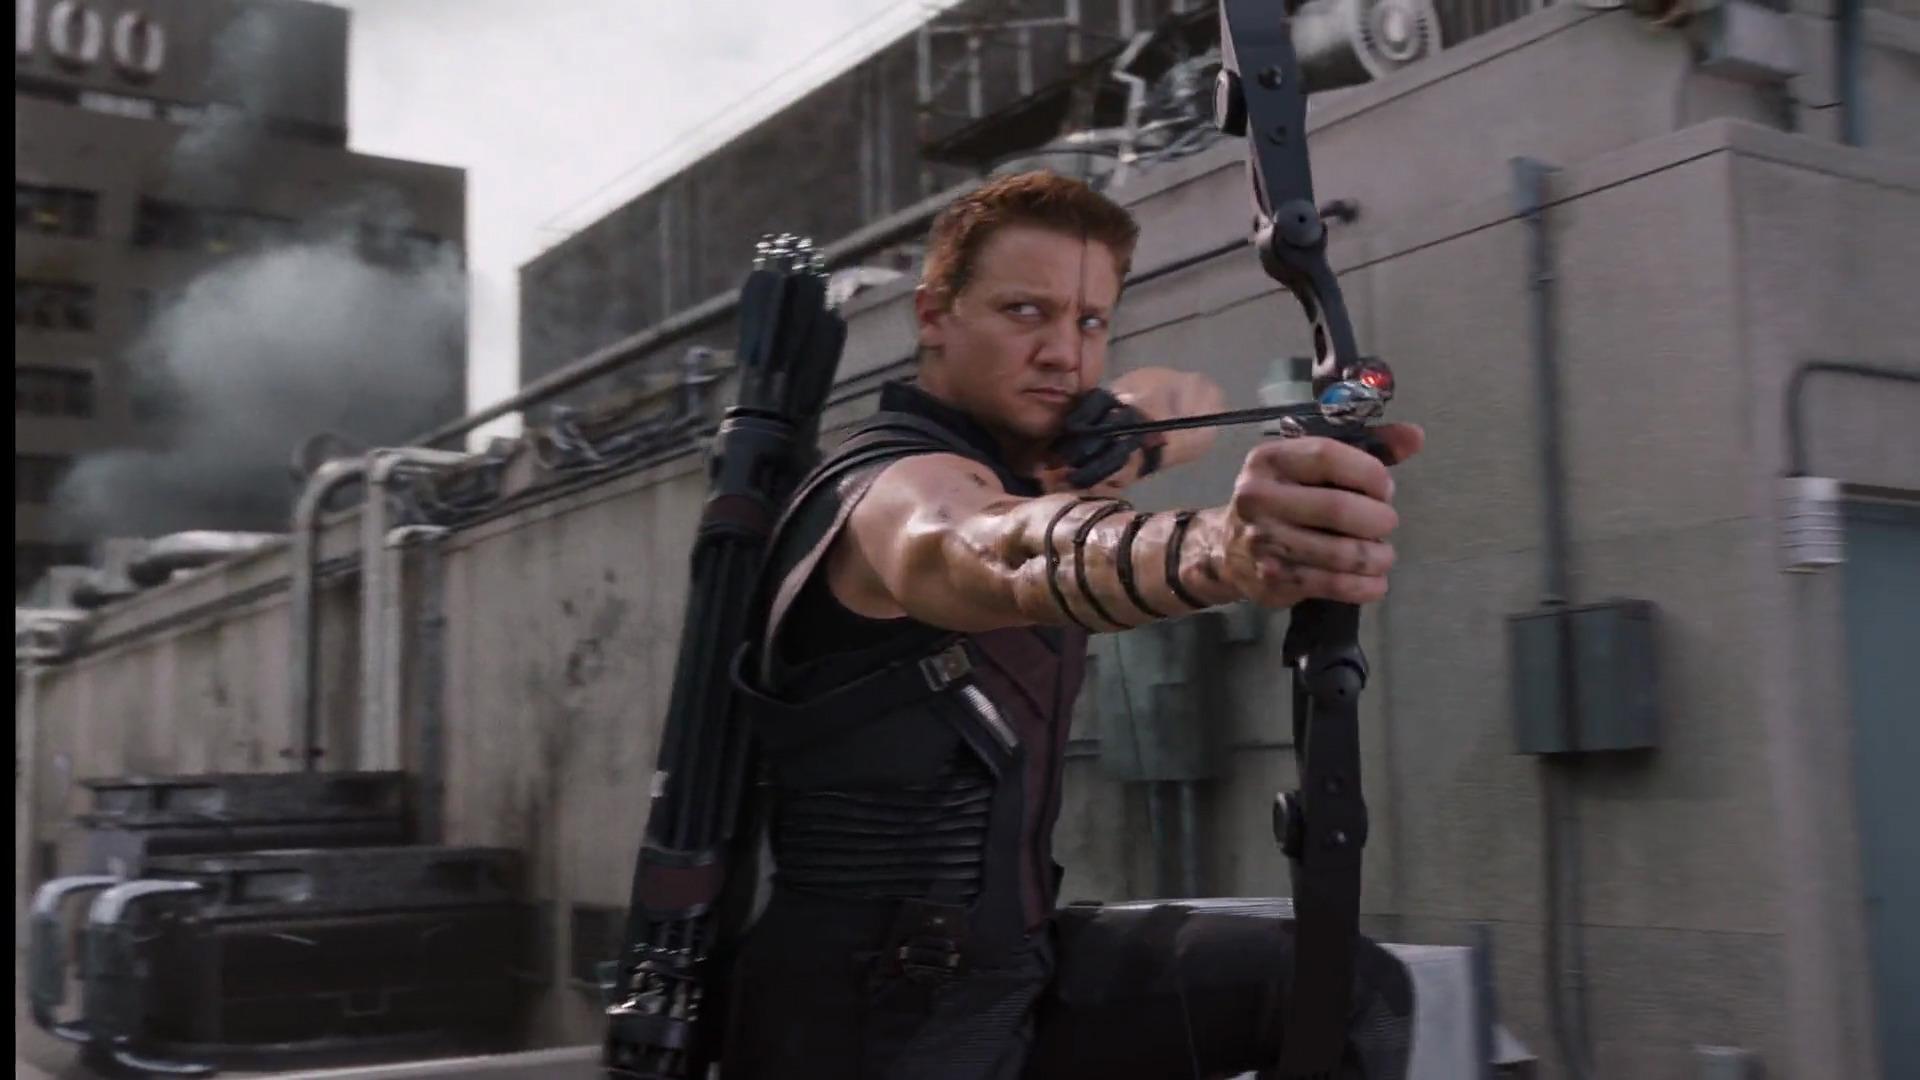 image - hawkeye arrow stance | marvel cinematic universe wiki